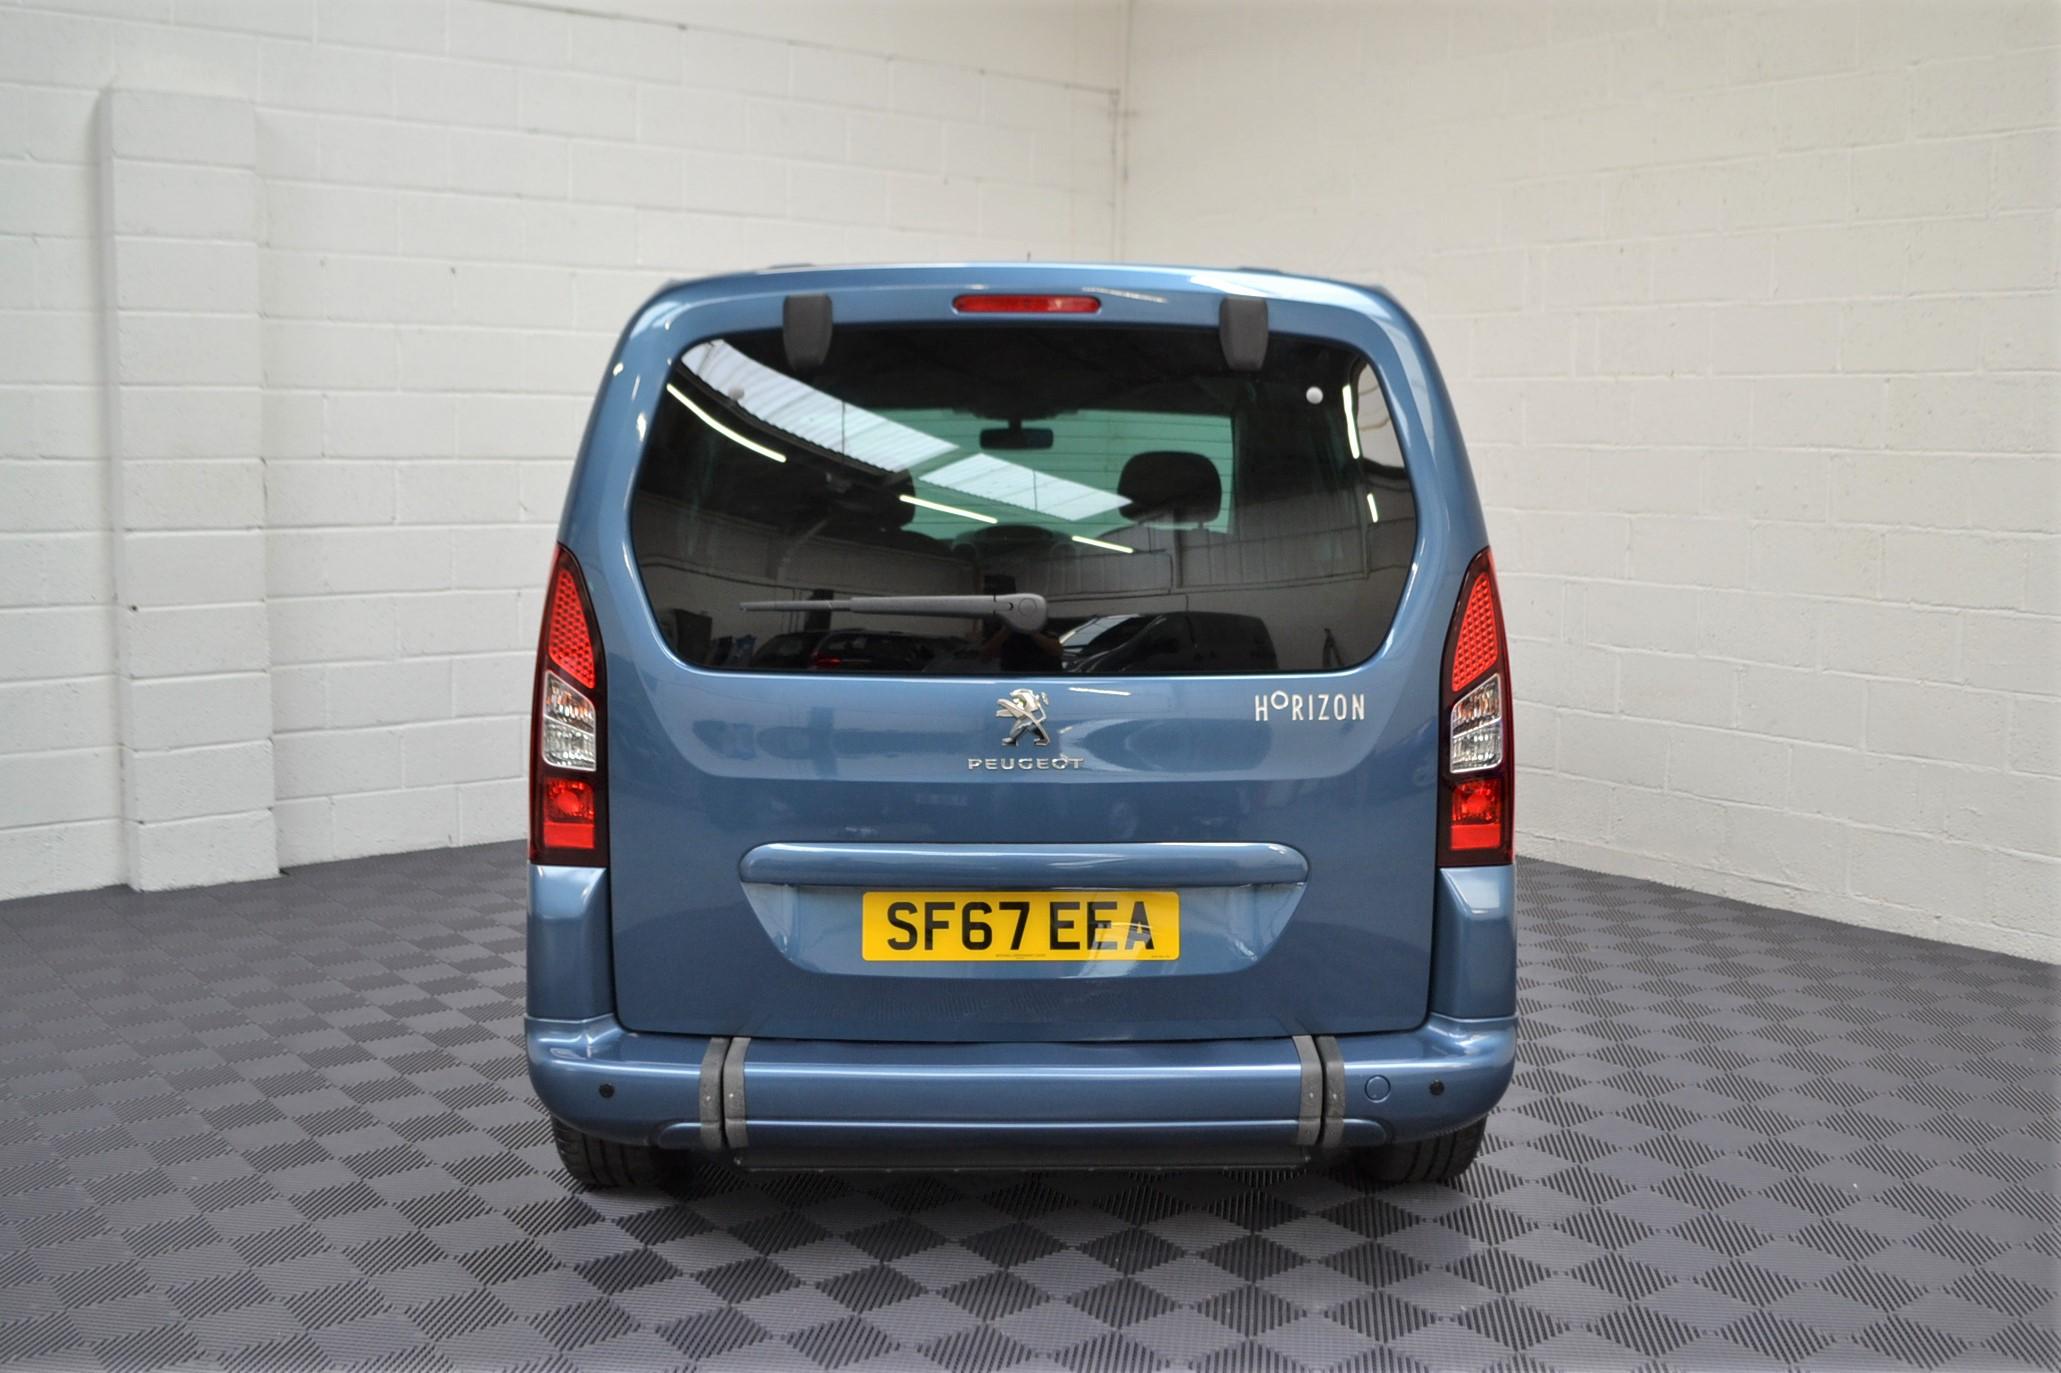 WAV Cars For Sale Bristol Wheelchair Accessible Vehicles Used For Sale Somerset Devon Dorset Bath Peugeot Partner SF67 EEA 10